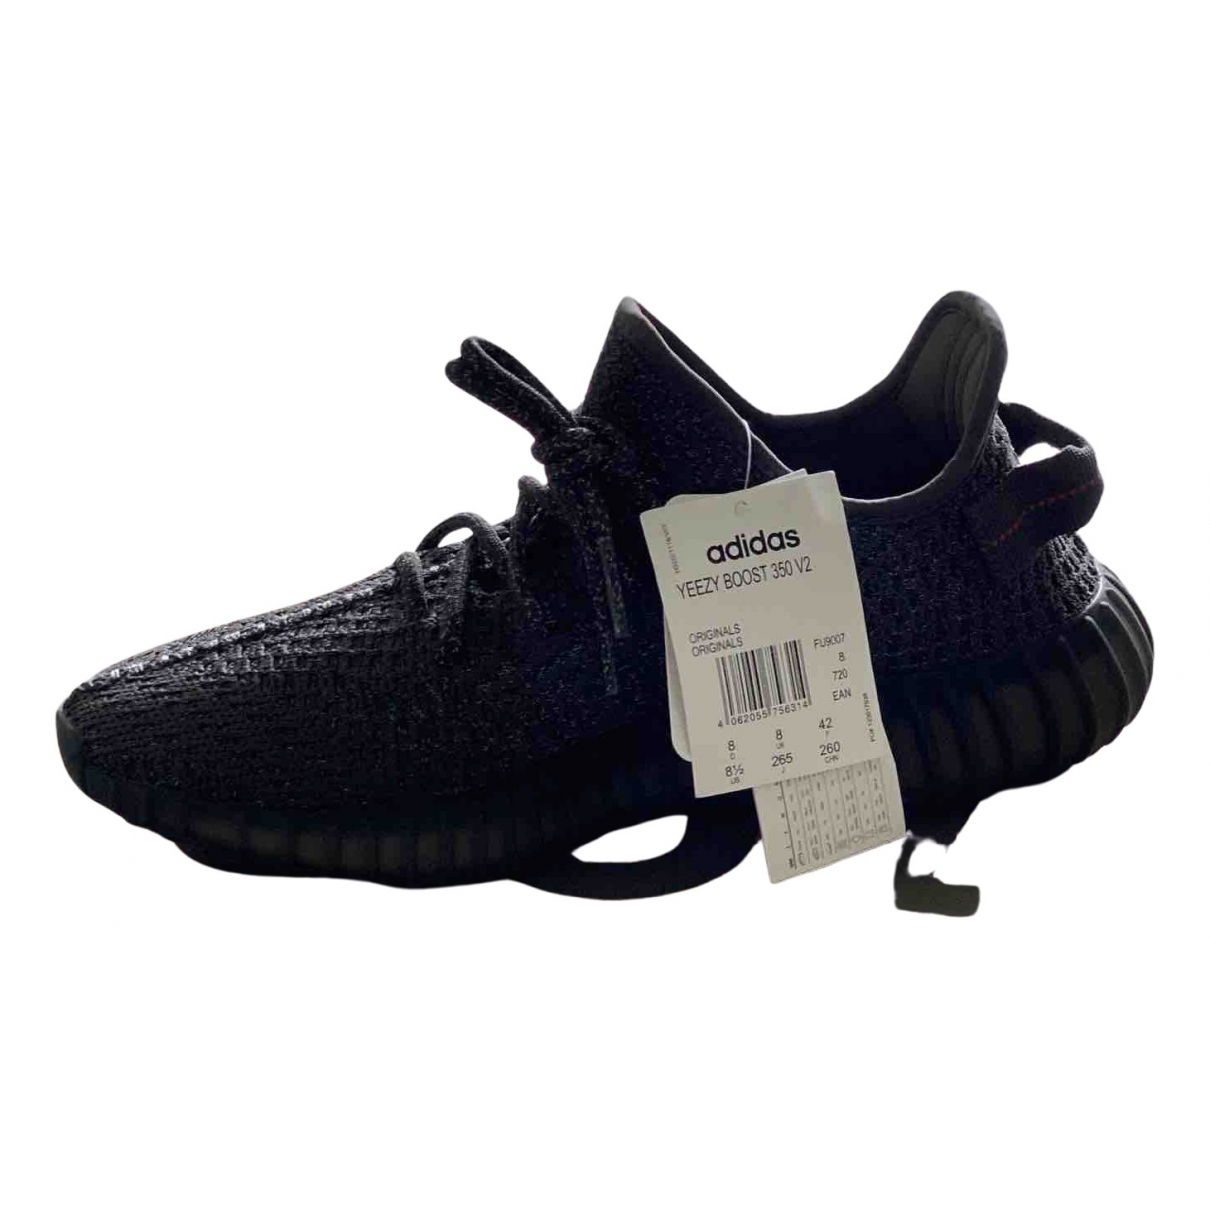 Yeezy X Adidas Boost 350 V2 Black Trainers for Men 42 EU